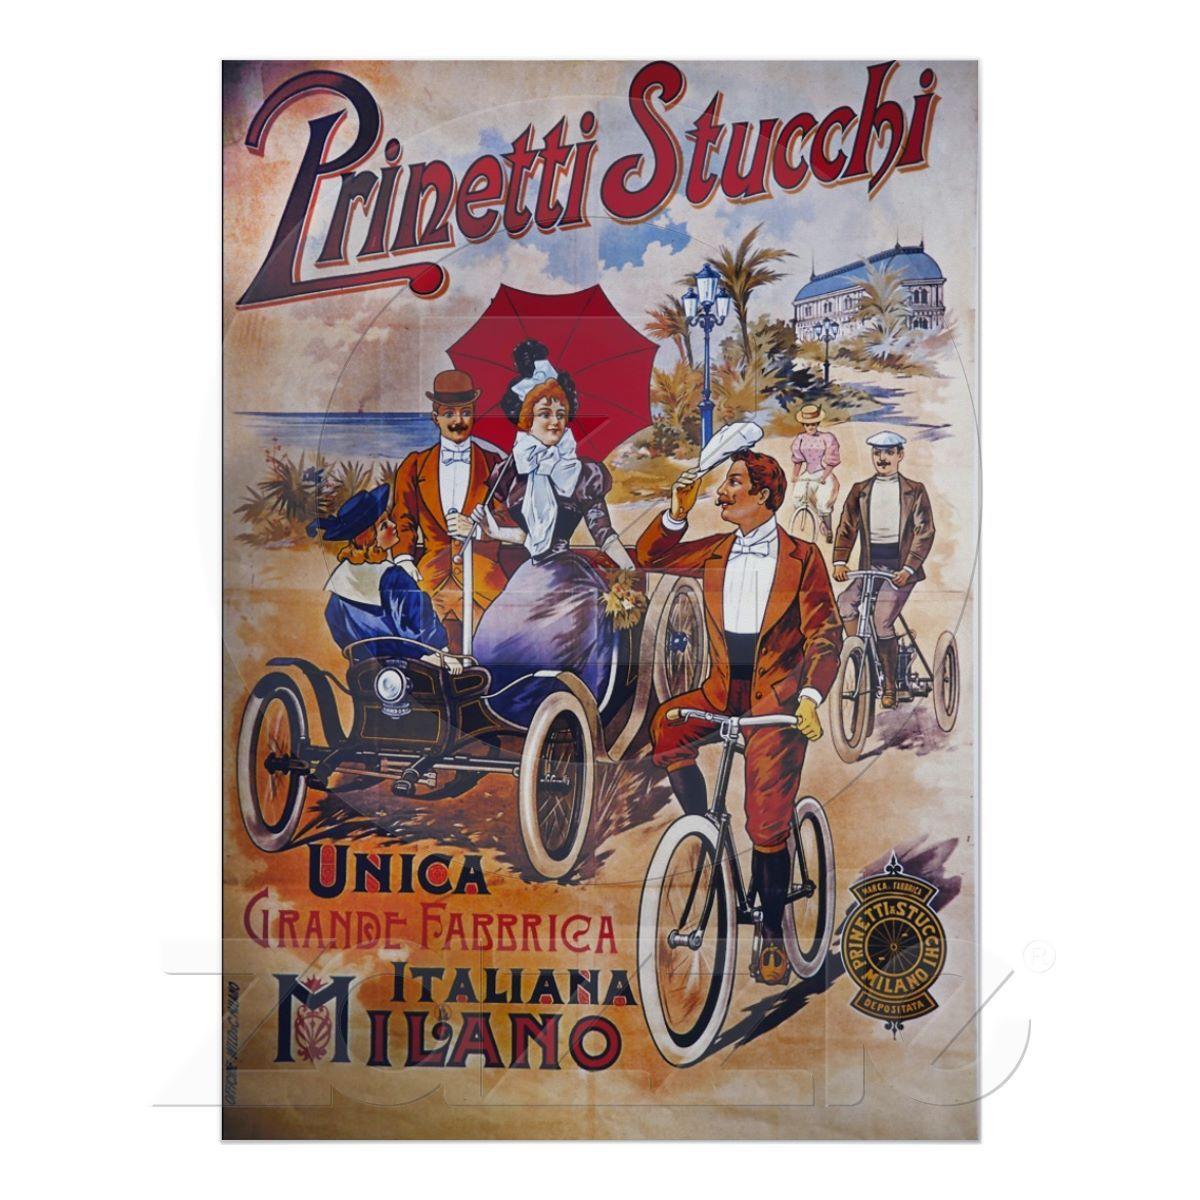 Vintagecykelaffisch, italienare, Prinetti Stucchi från Zazzle.se